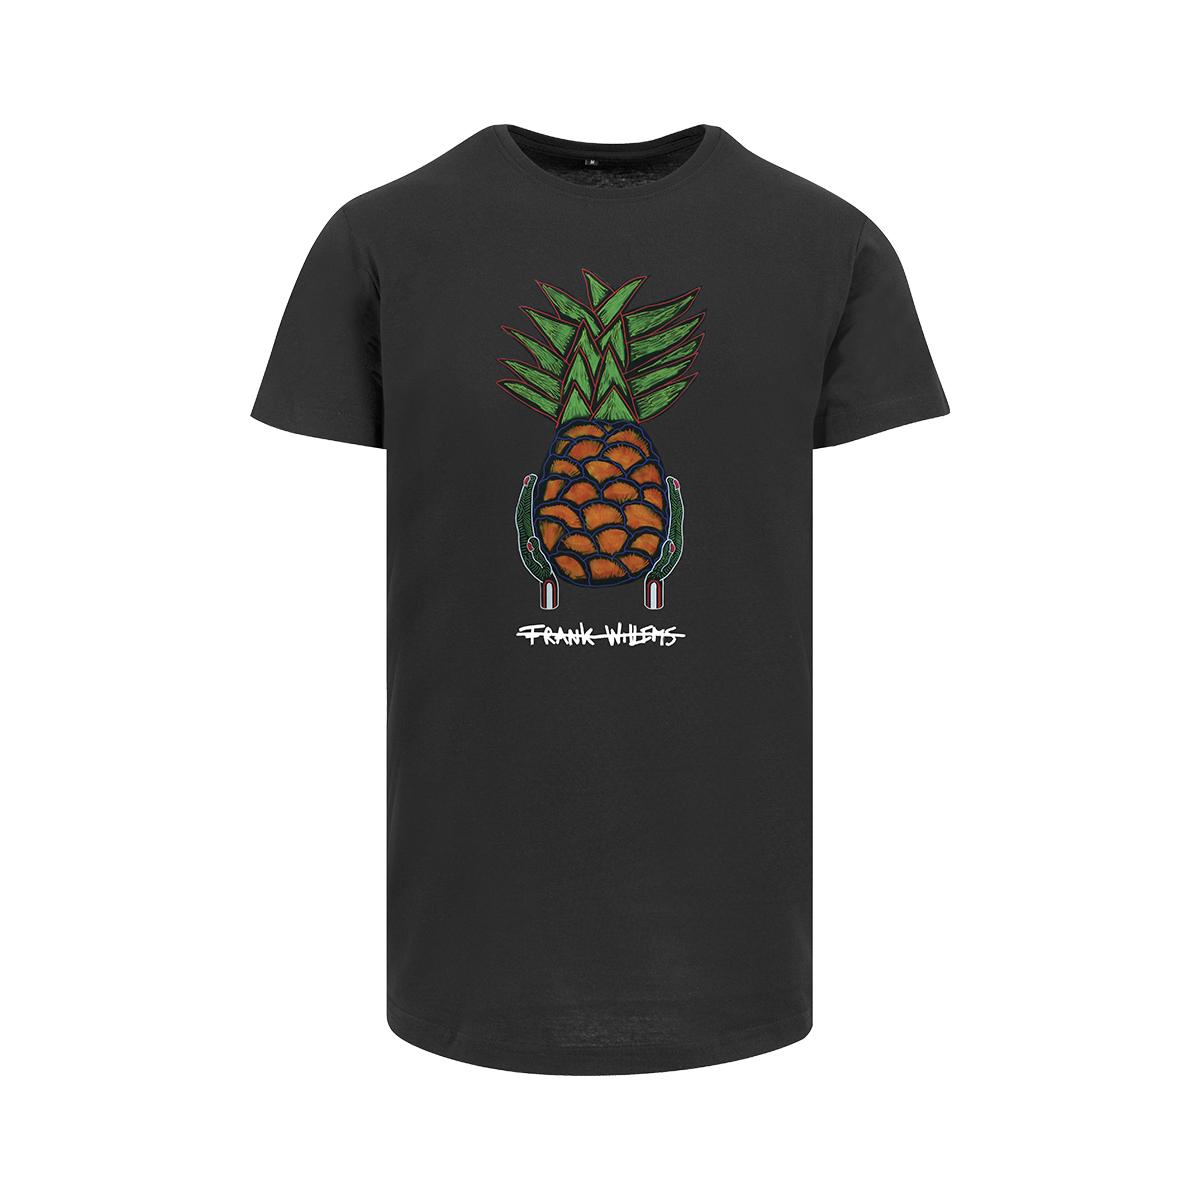 Frank Willems - Longfit T-shirt - Yummy Pineapple - BLK